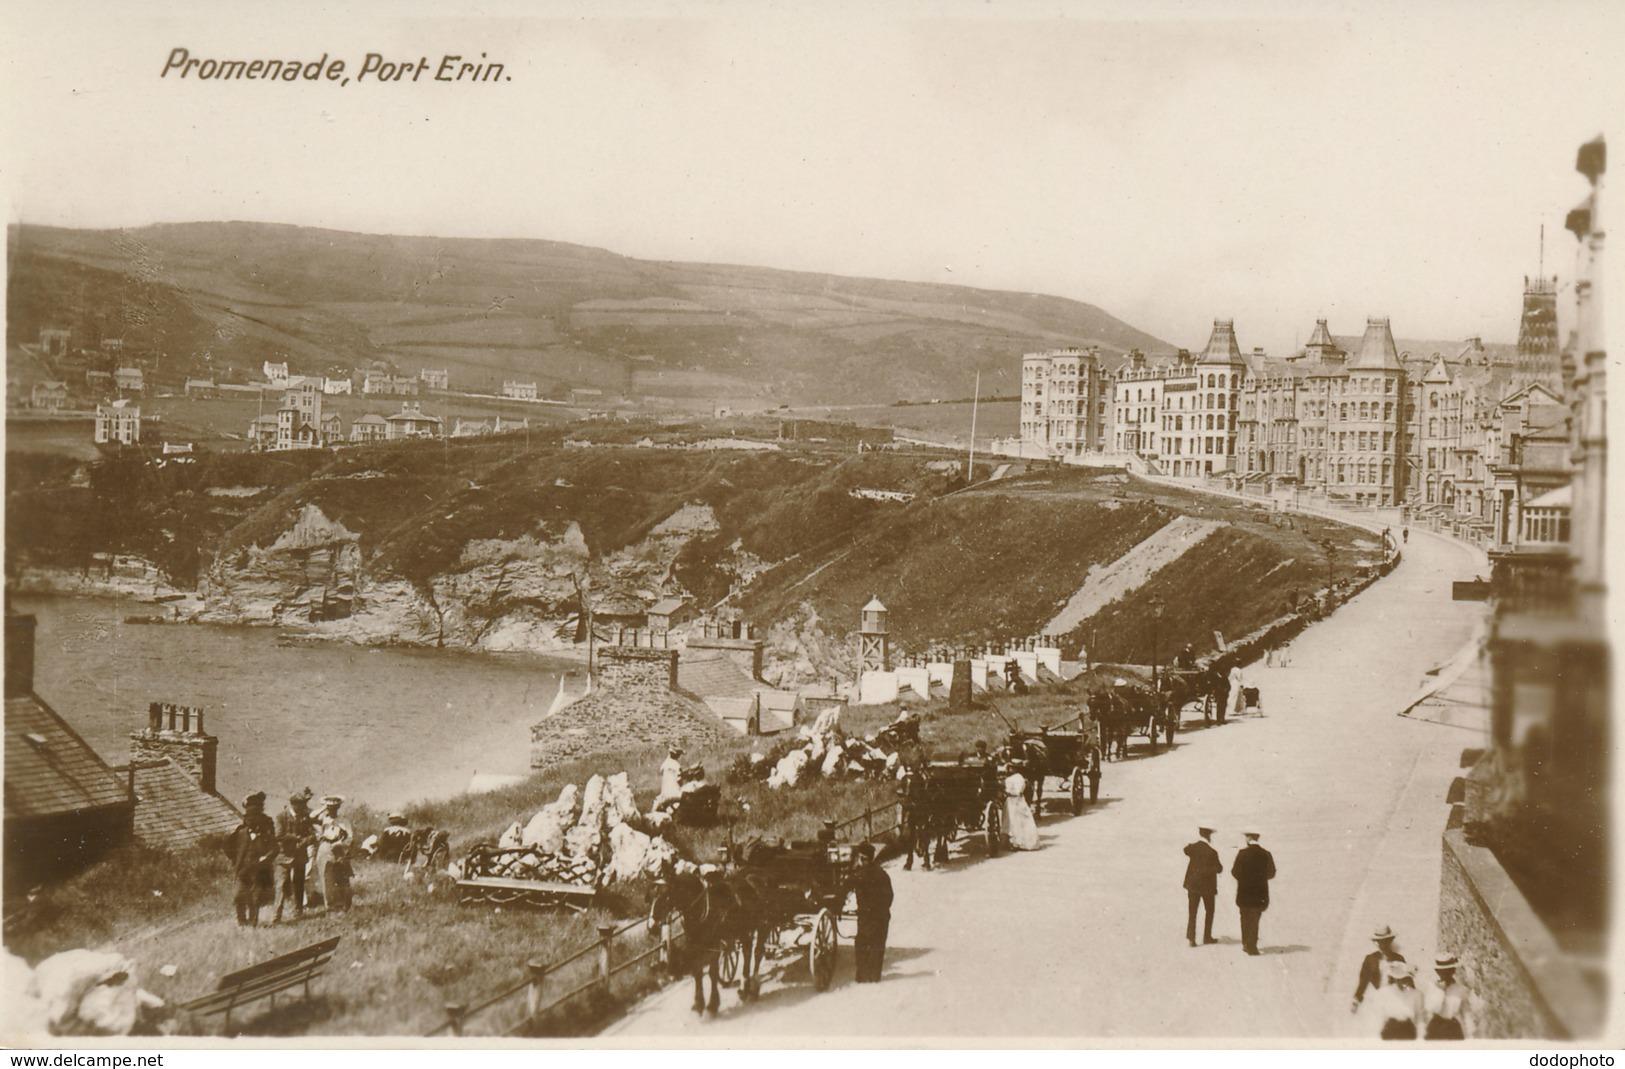 PC76598 Promenade. Port Erin. Milton. Woolstone Bros - Postcards